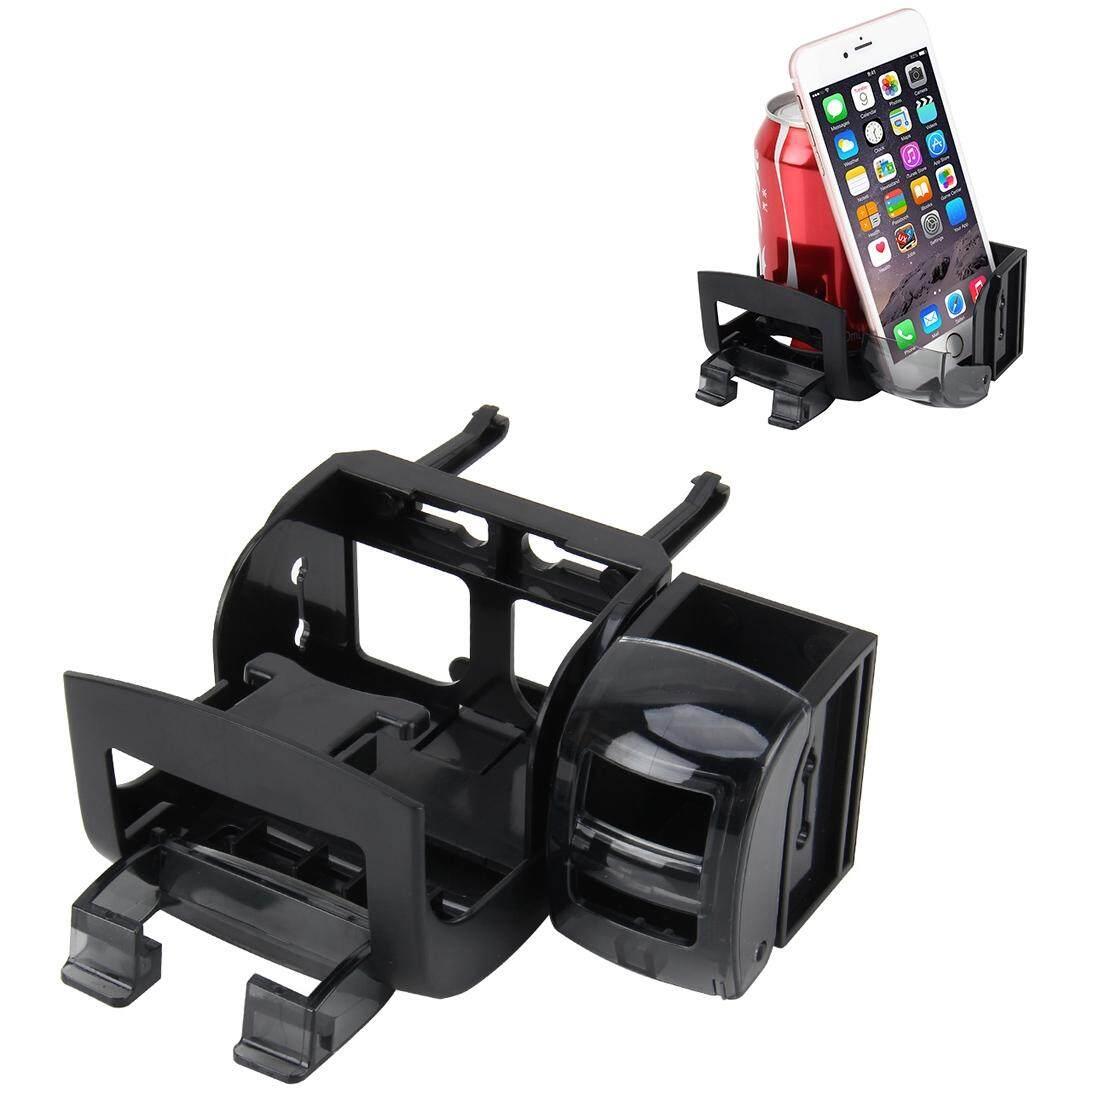 Shunwei Portabel Multifungsi Vehicle Cangkir Ponsel Penahan Pemegang Minuman Kotak Sarung Aksesoris Mobil-Internasional